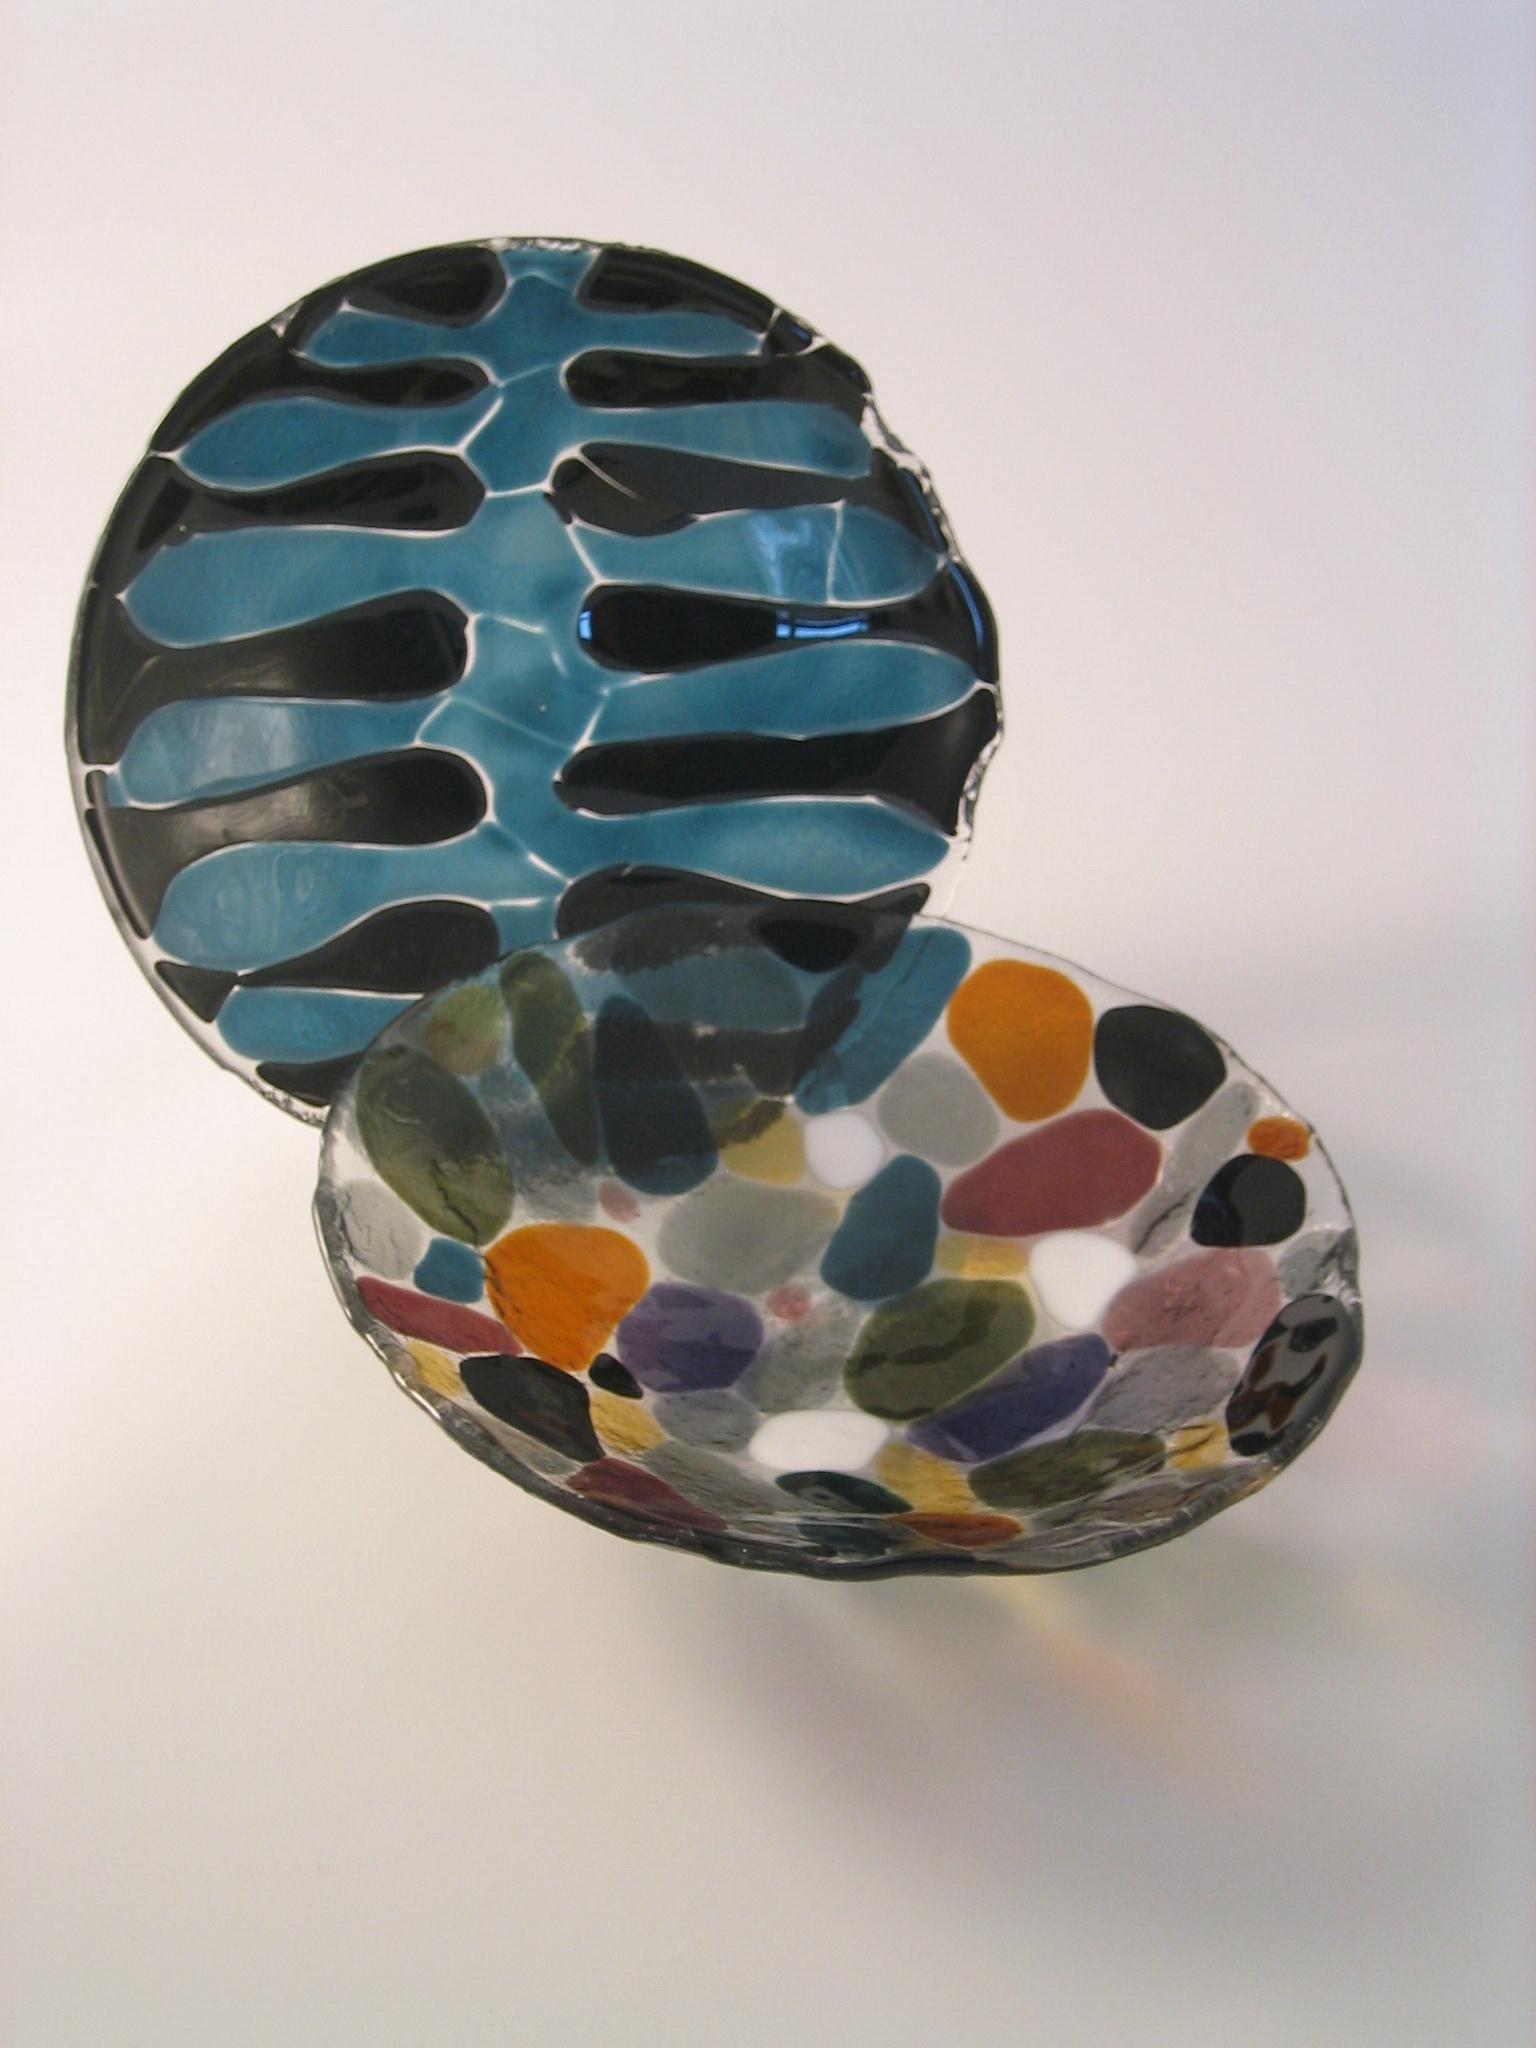 Coast Bowls - Vessels / Bowls